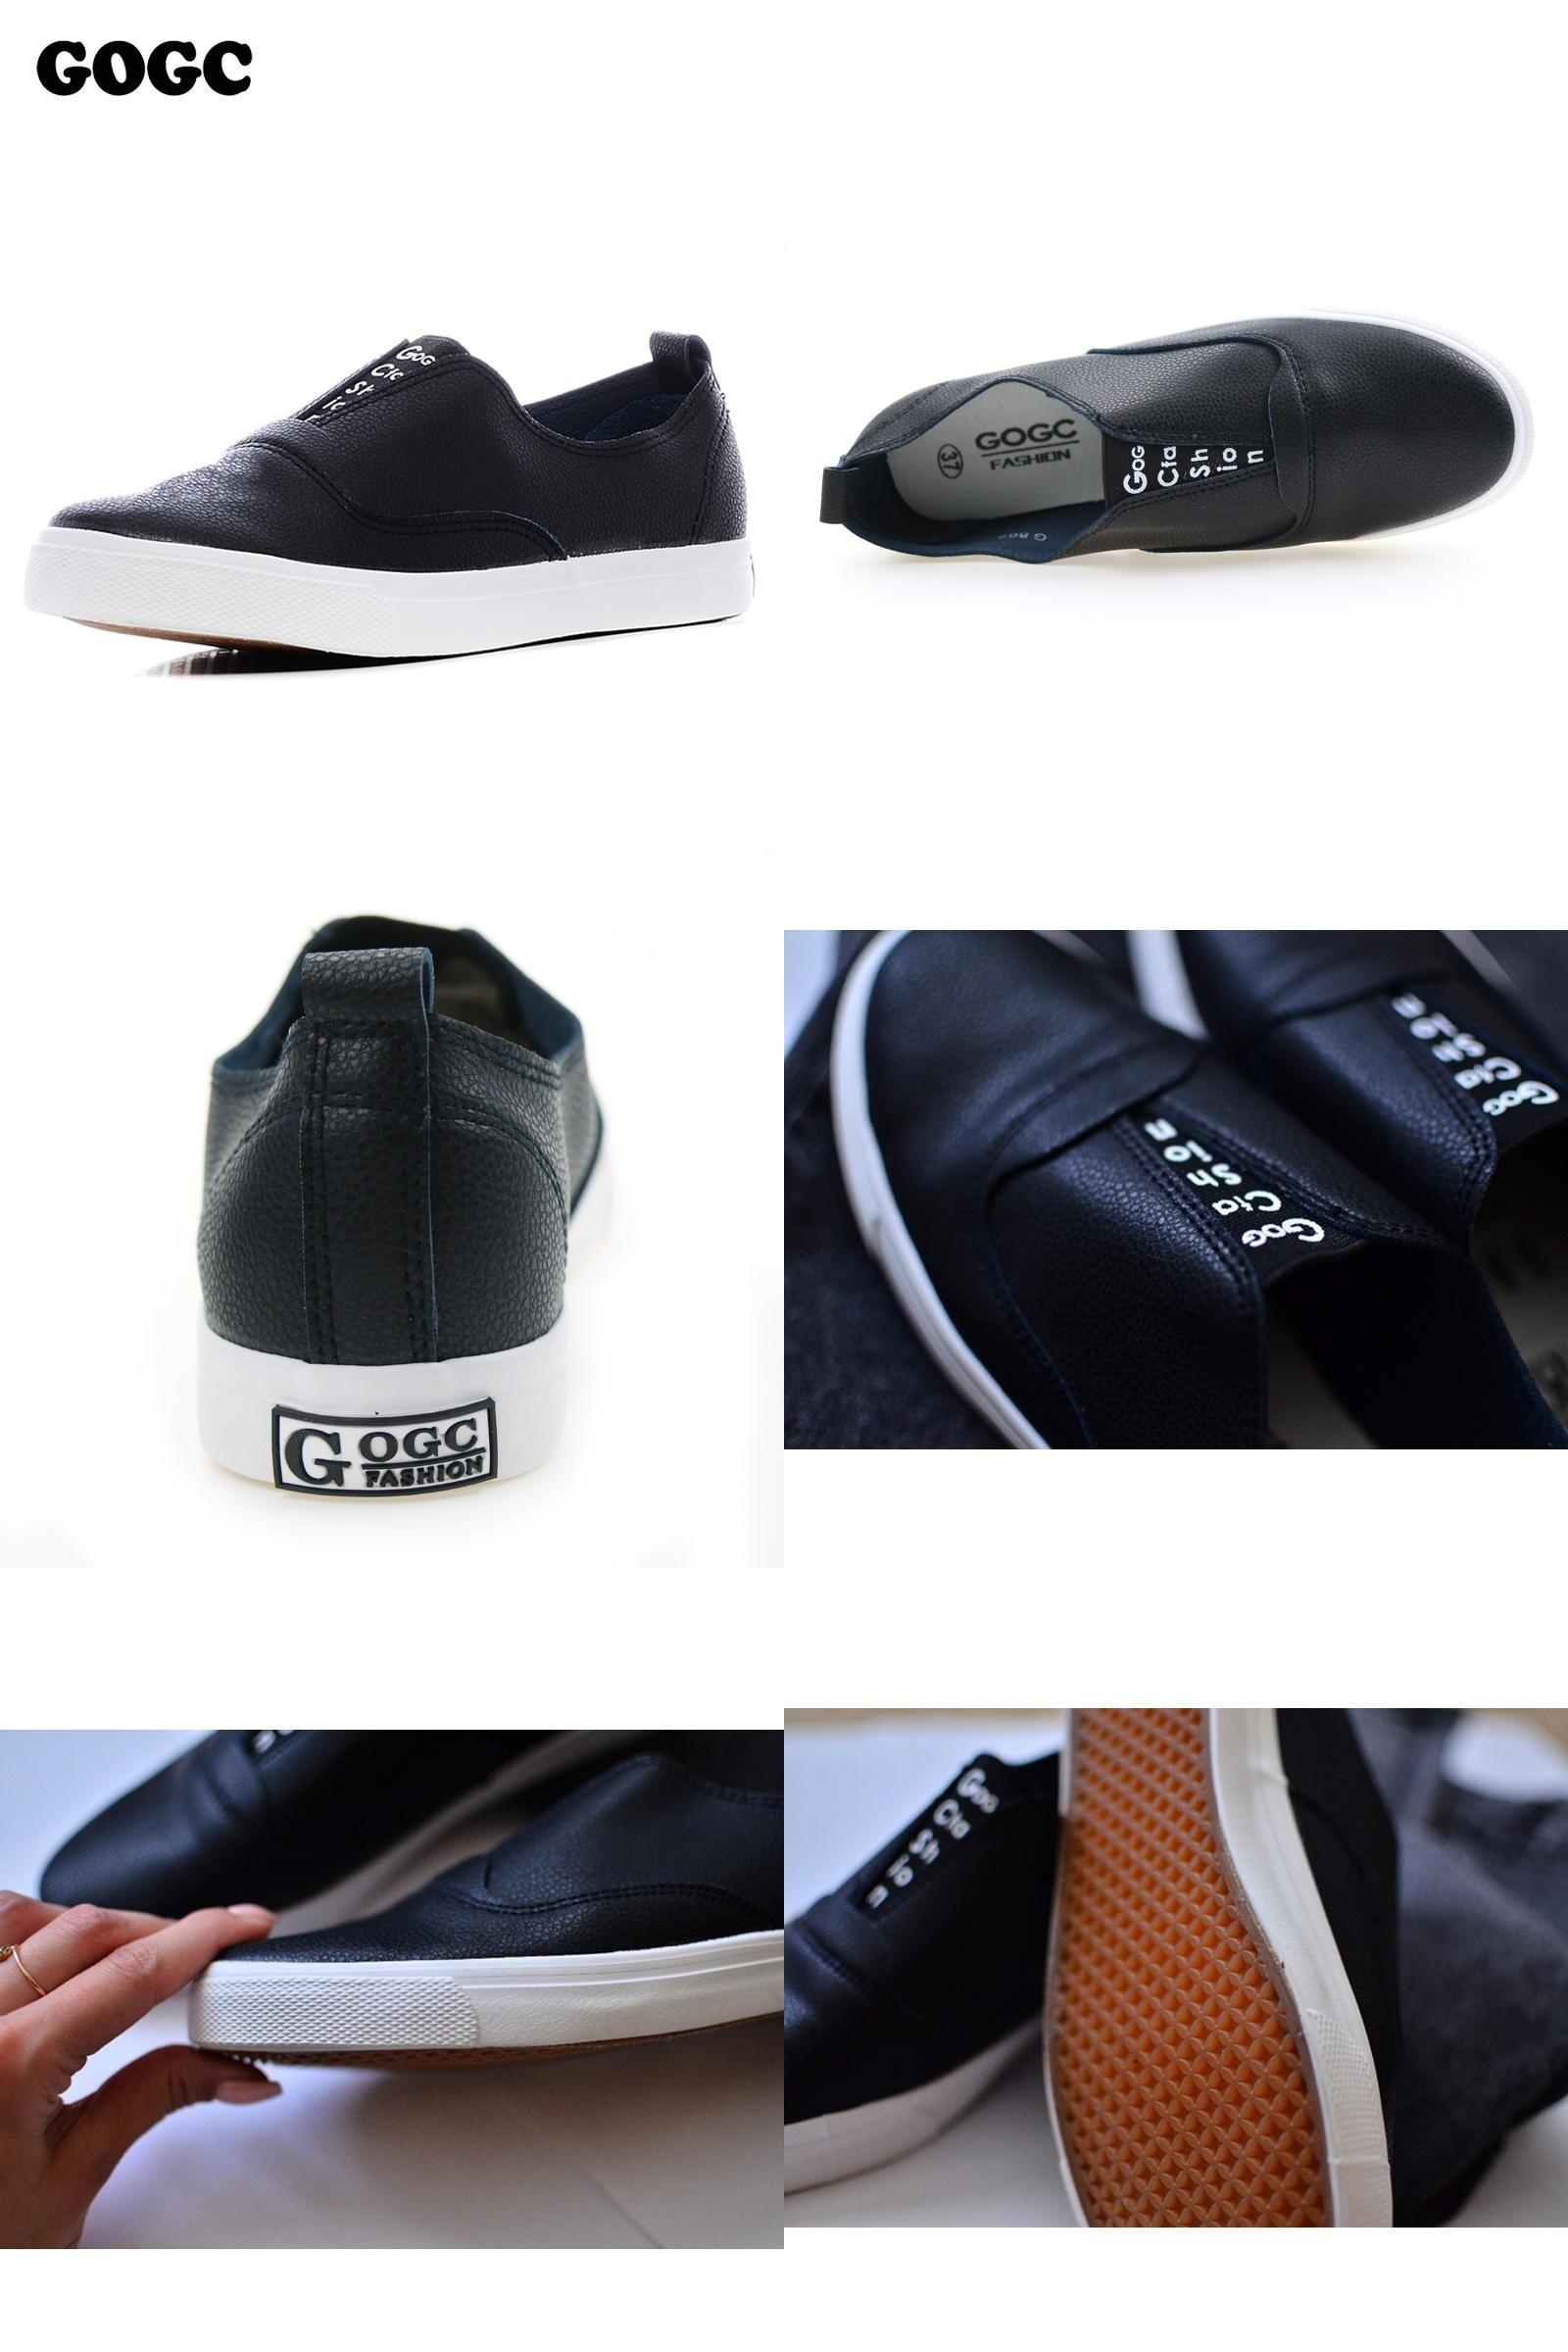 e0cbd154a377f [Visit to Buy] GOGC 2017 New Slipony Women Black Leather Casual Shoes Women Flats  Shoes Slip-on Breathable Slipony Shoes Women Vulcanized Shoes # ...